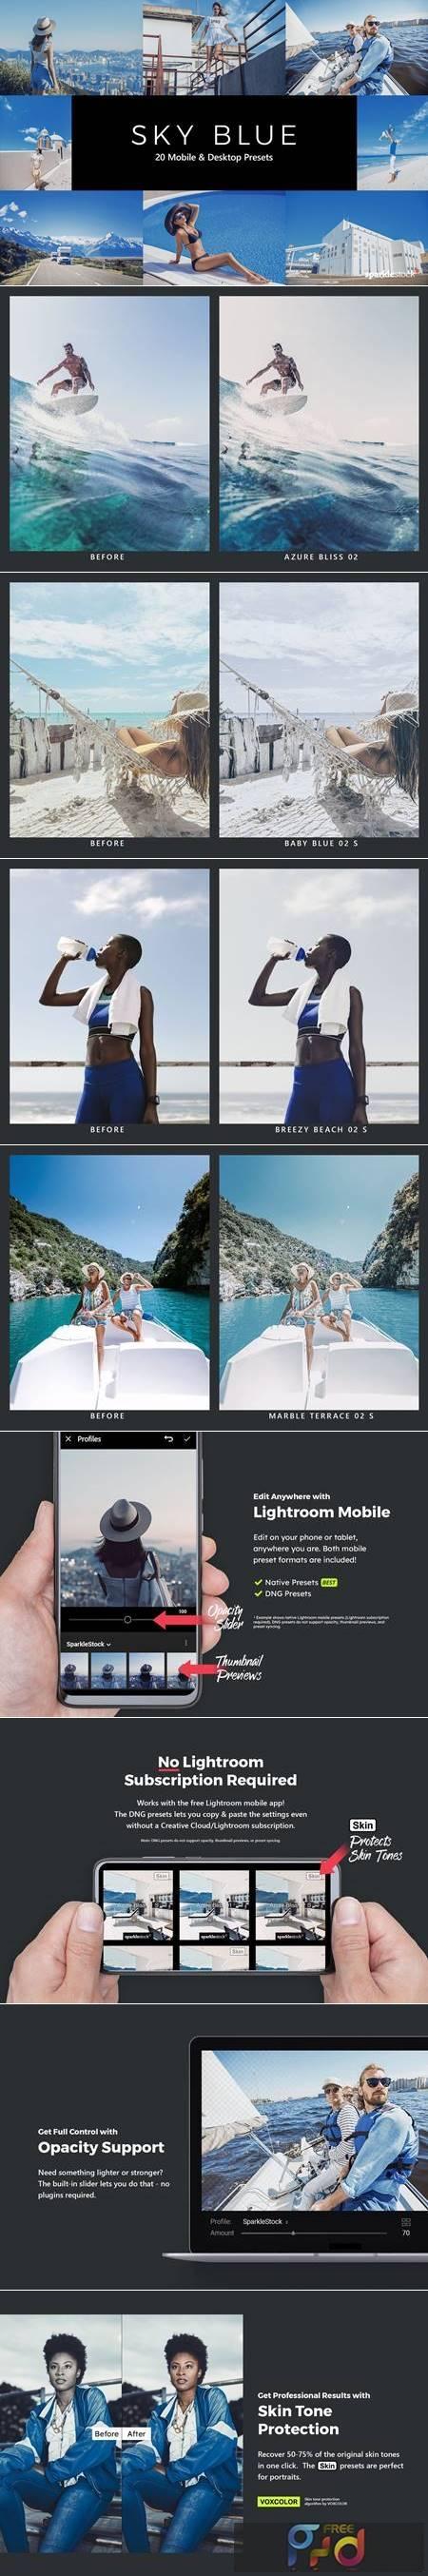 20 Sky Blue Lightroom Presets & LUTs QDFHAV3 1